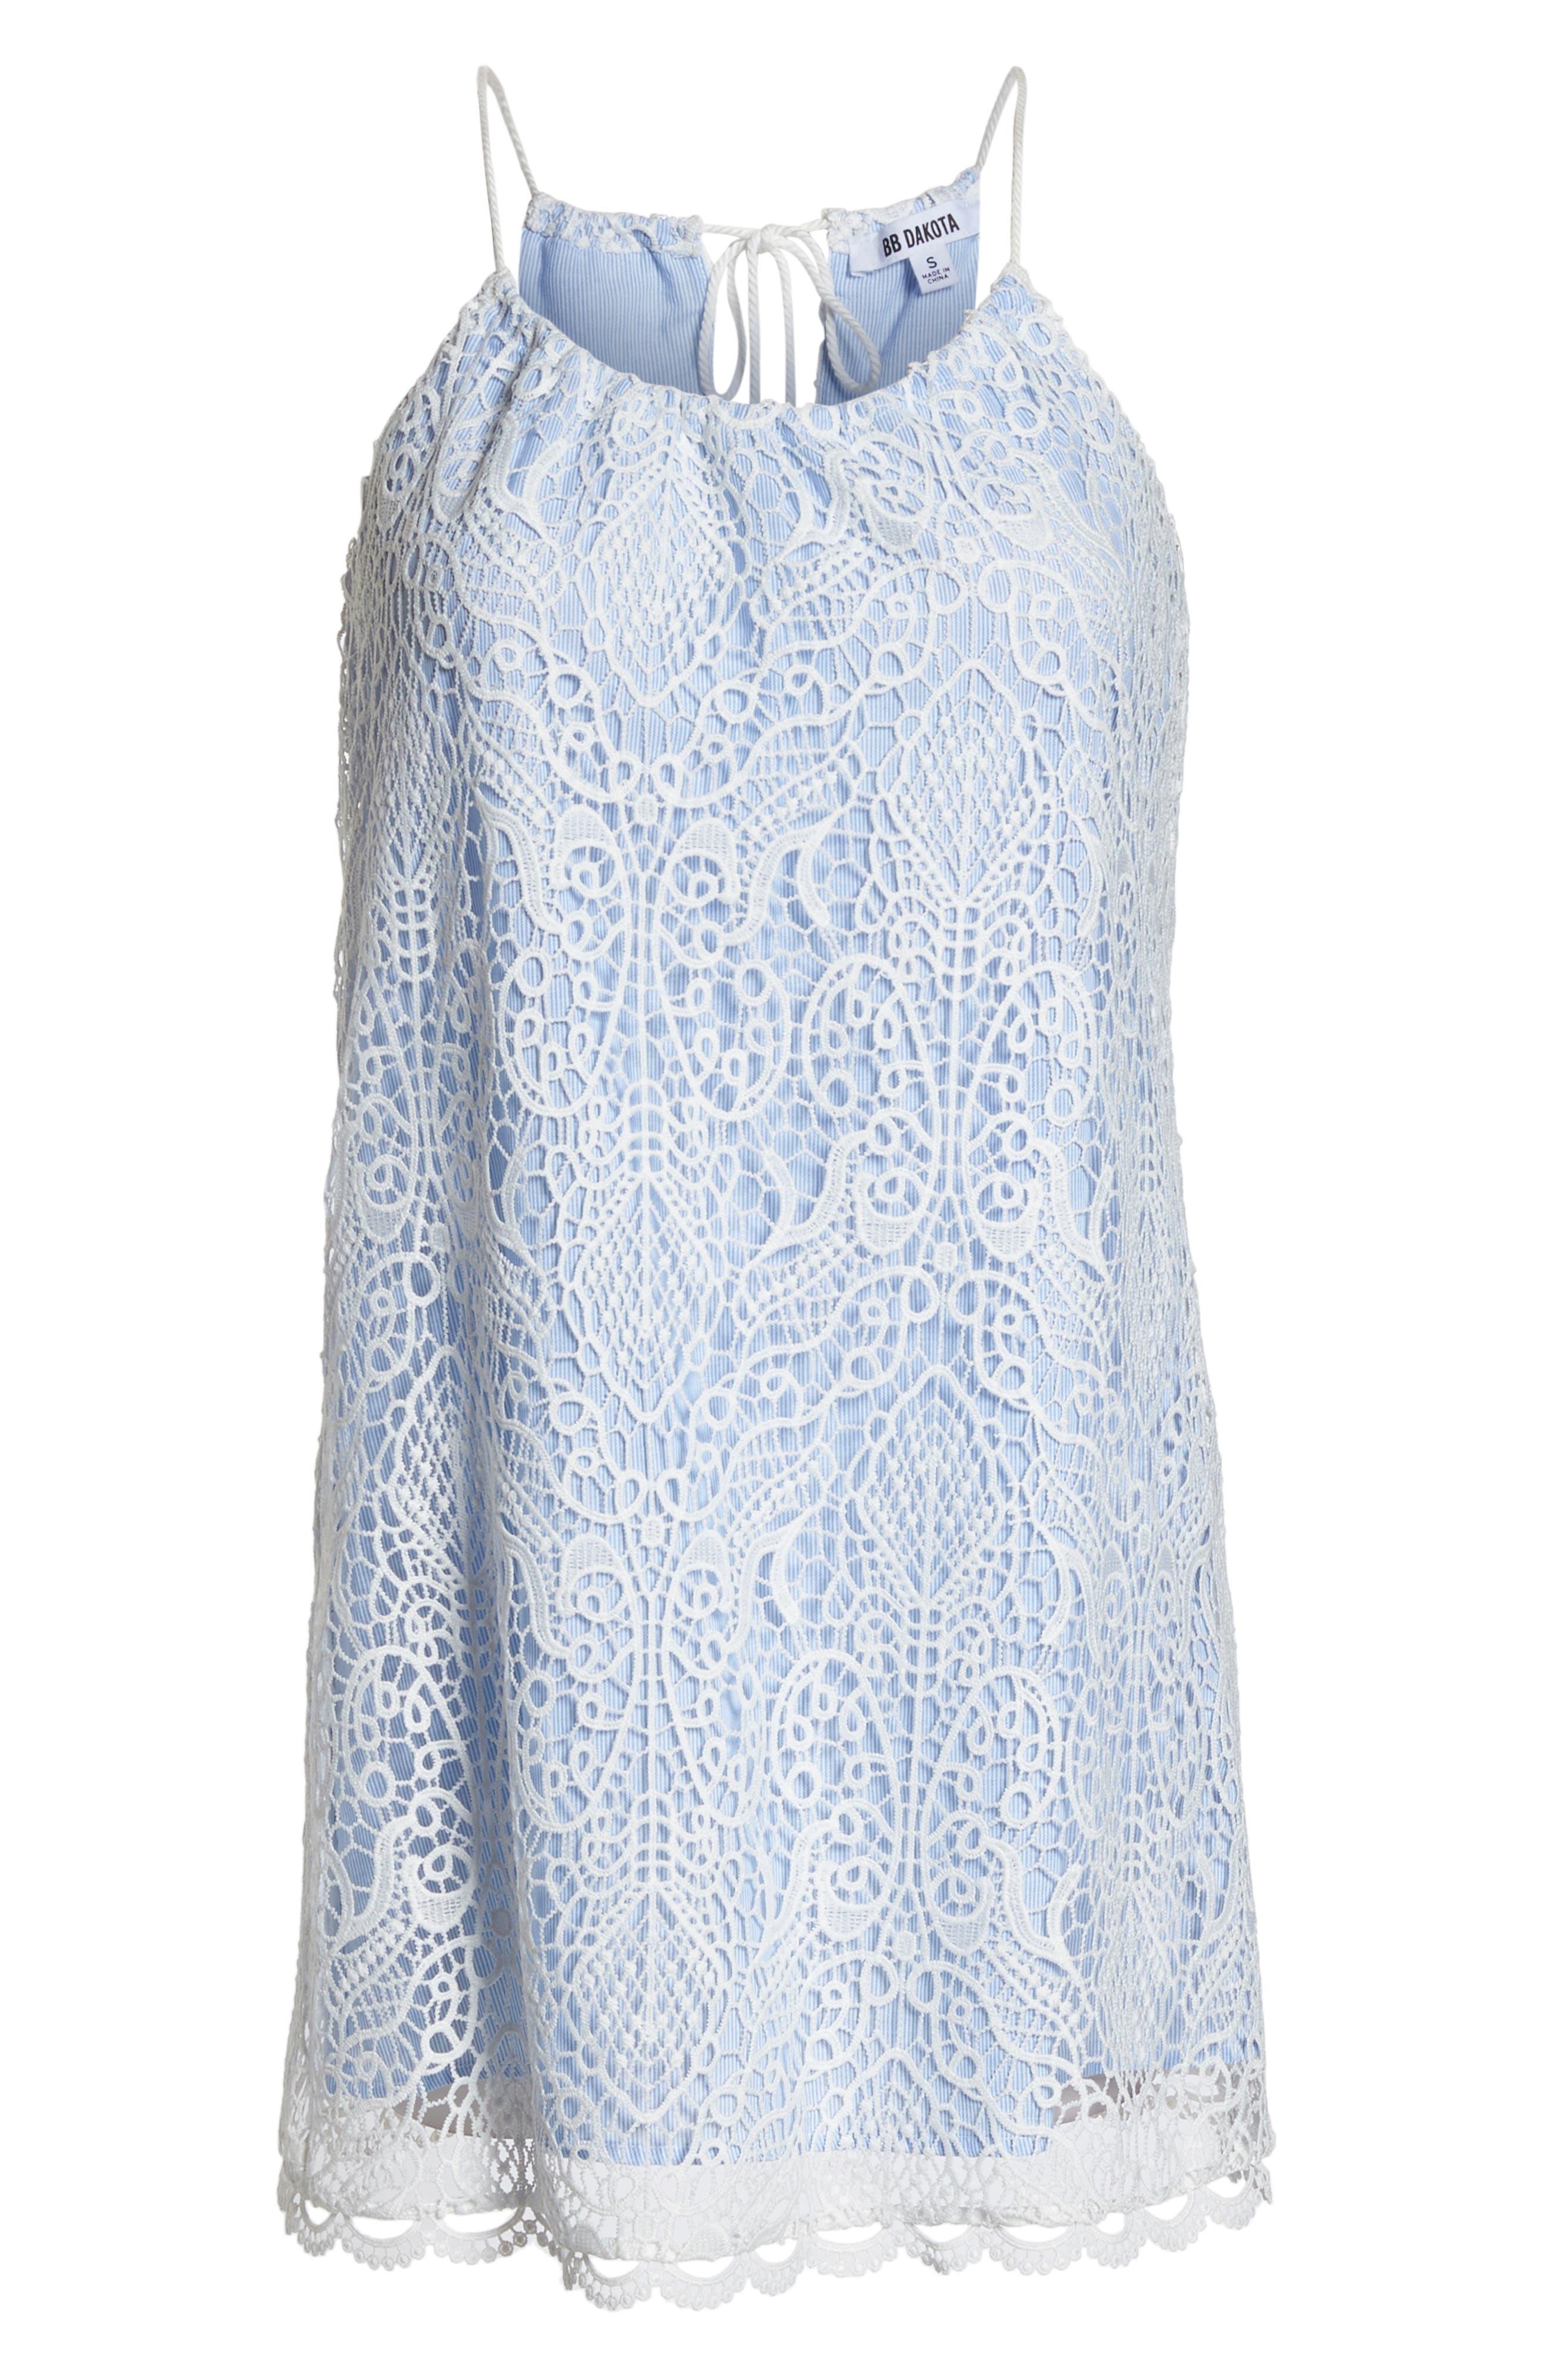 Pinstripe Cotton Lace Shift Dress,                             Alternate thumbnail 7, color,                             Ivory